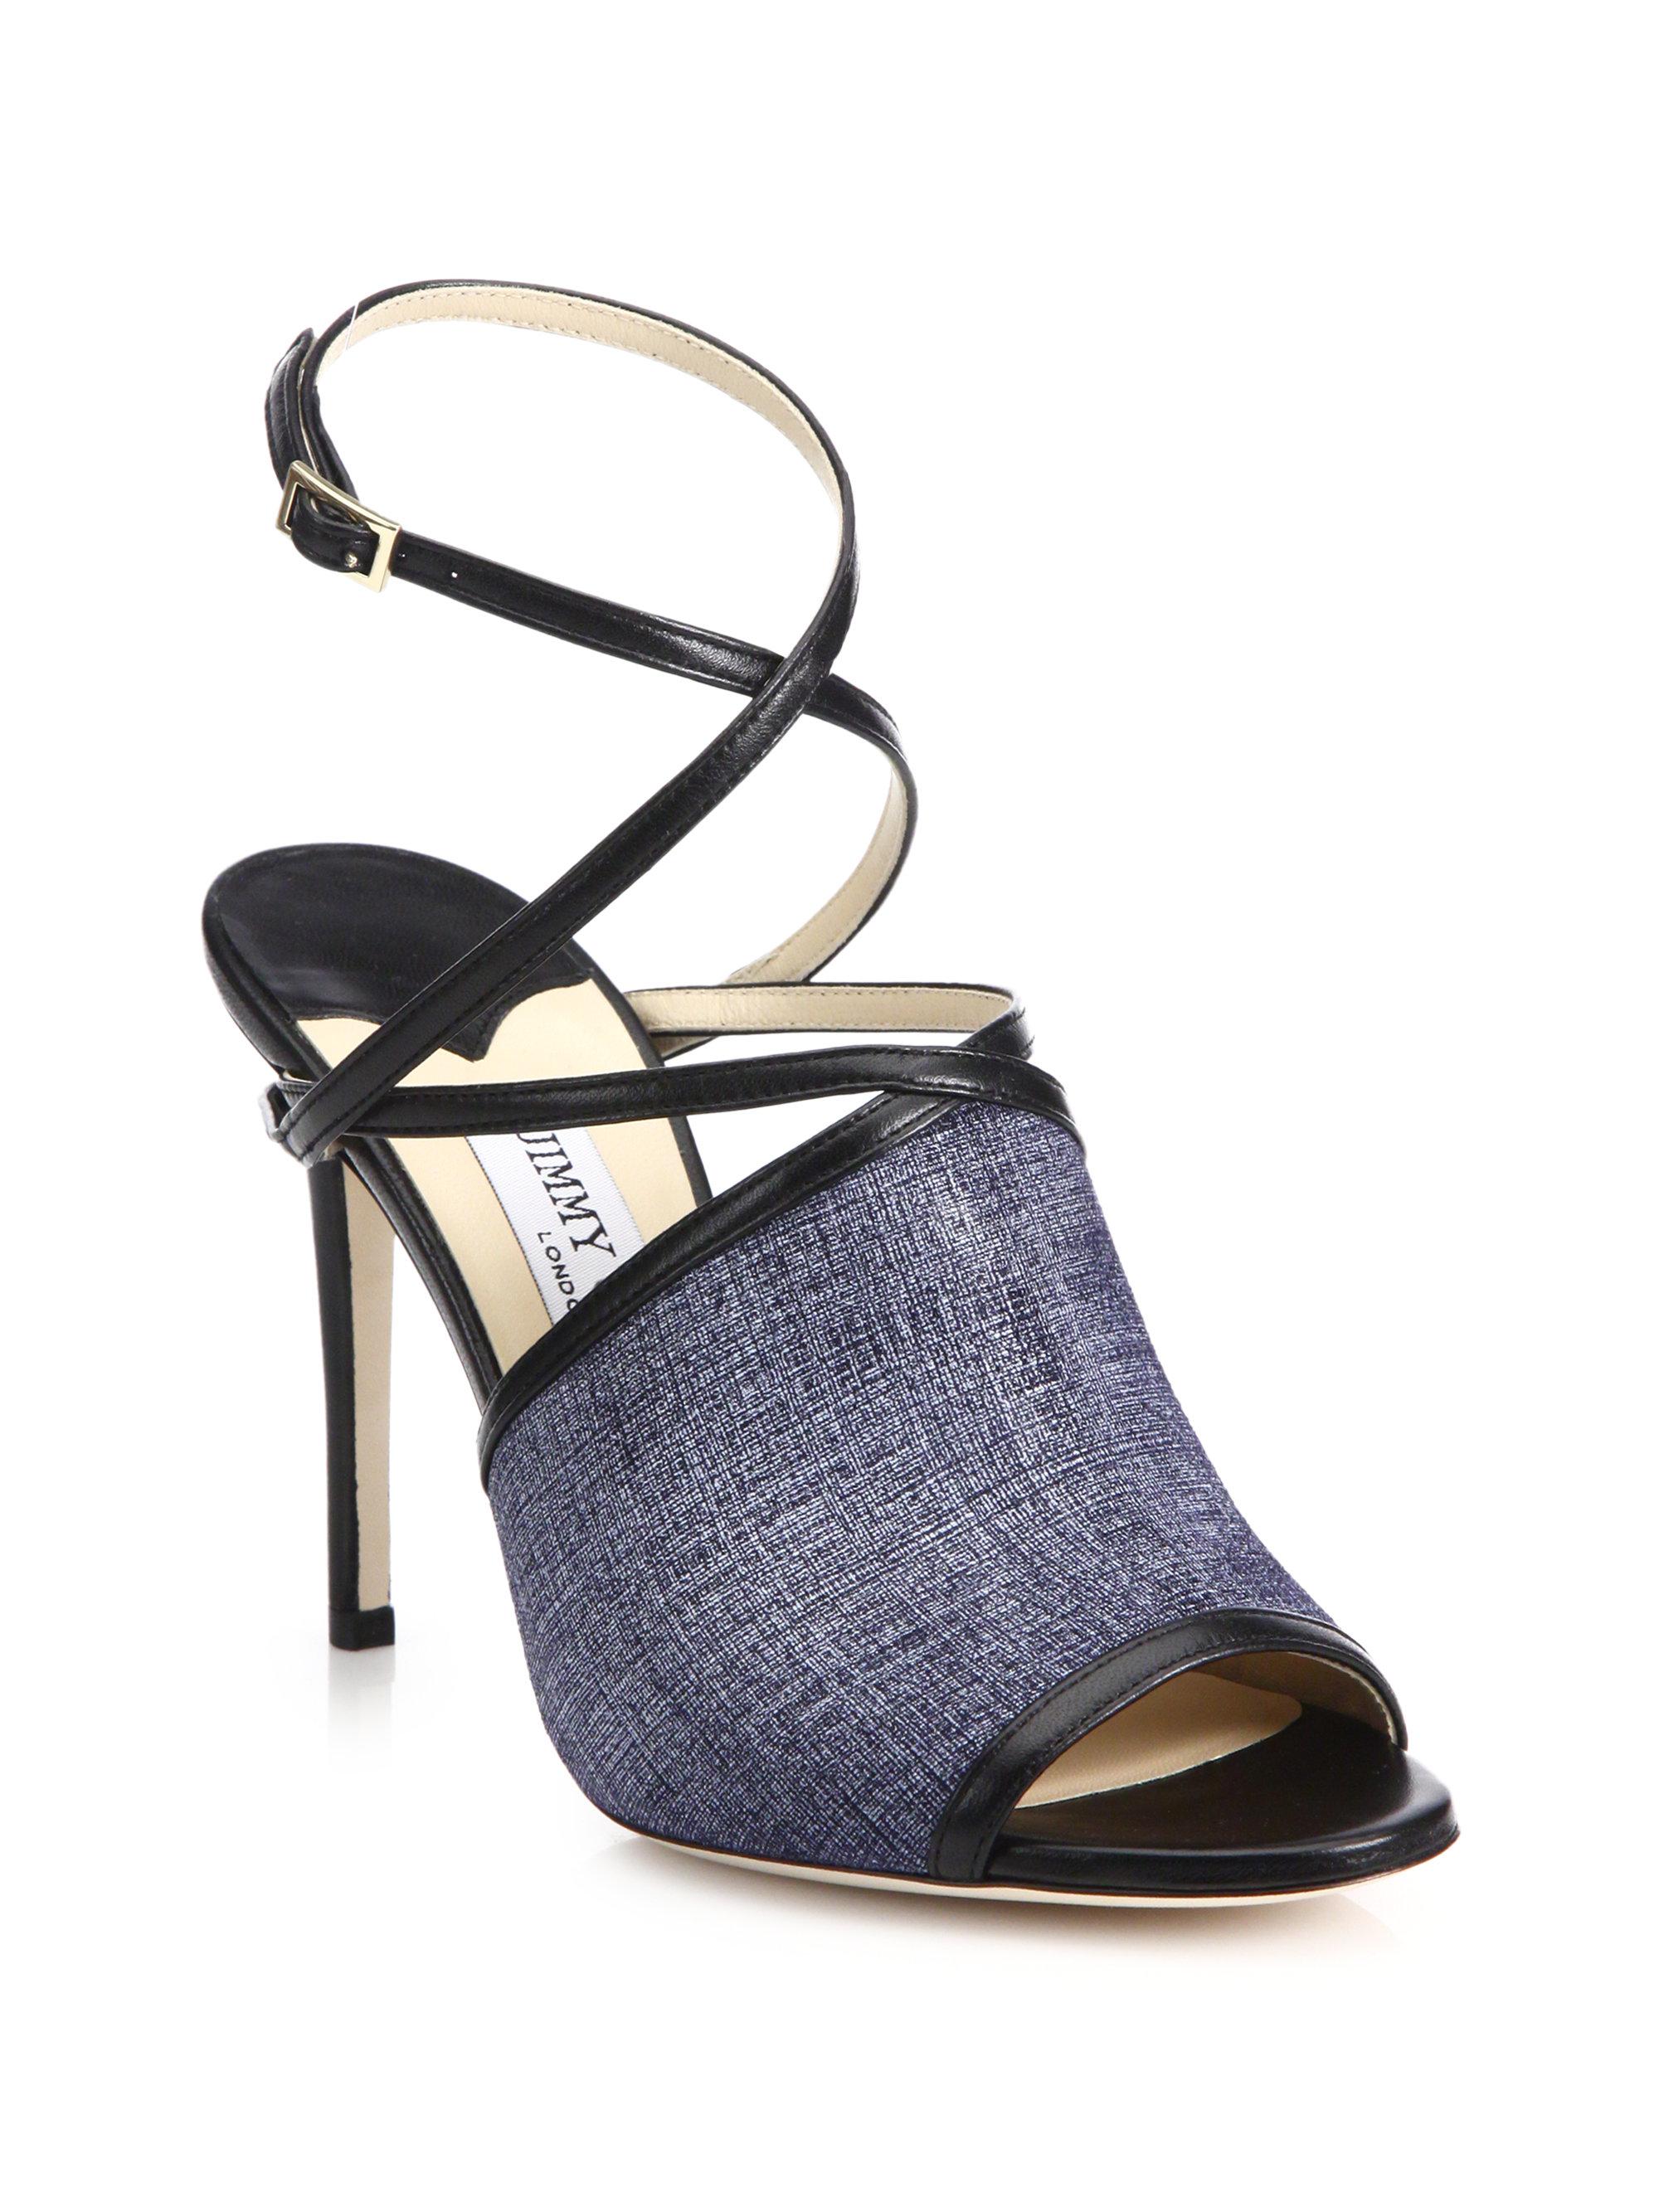 d61ac3363f42 Lyst - Jimmy Choo Flora Denim Leather Sandal in Blue